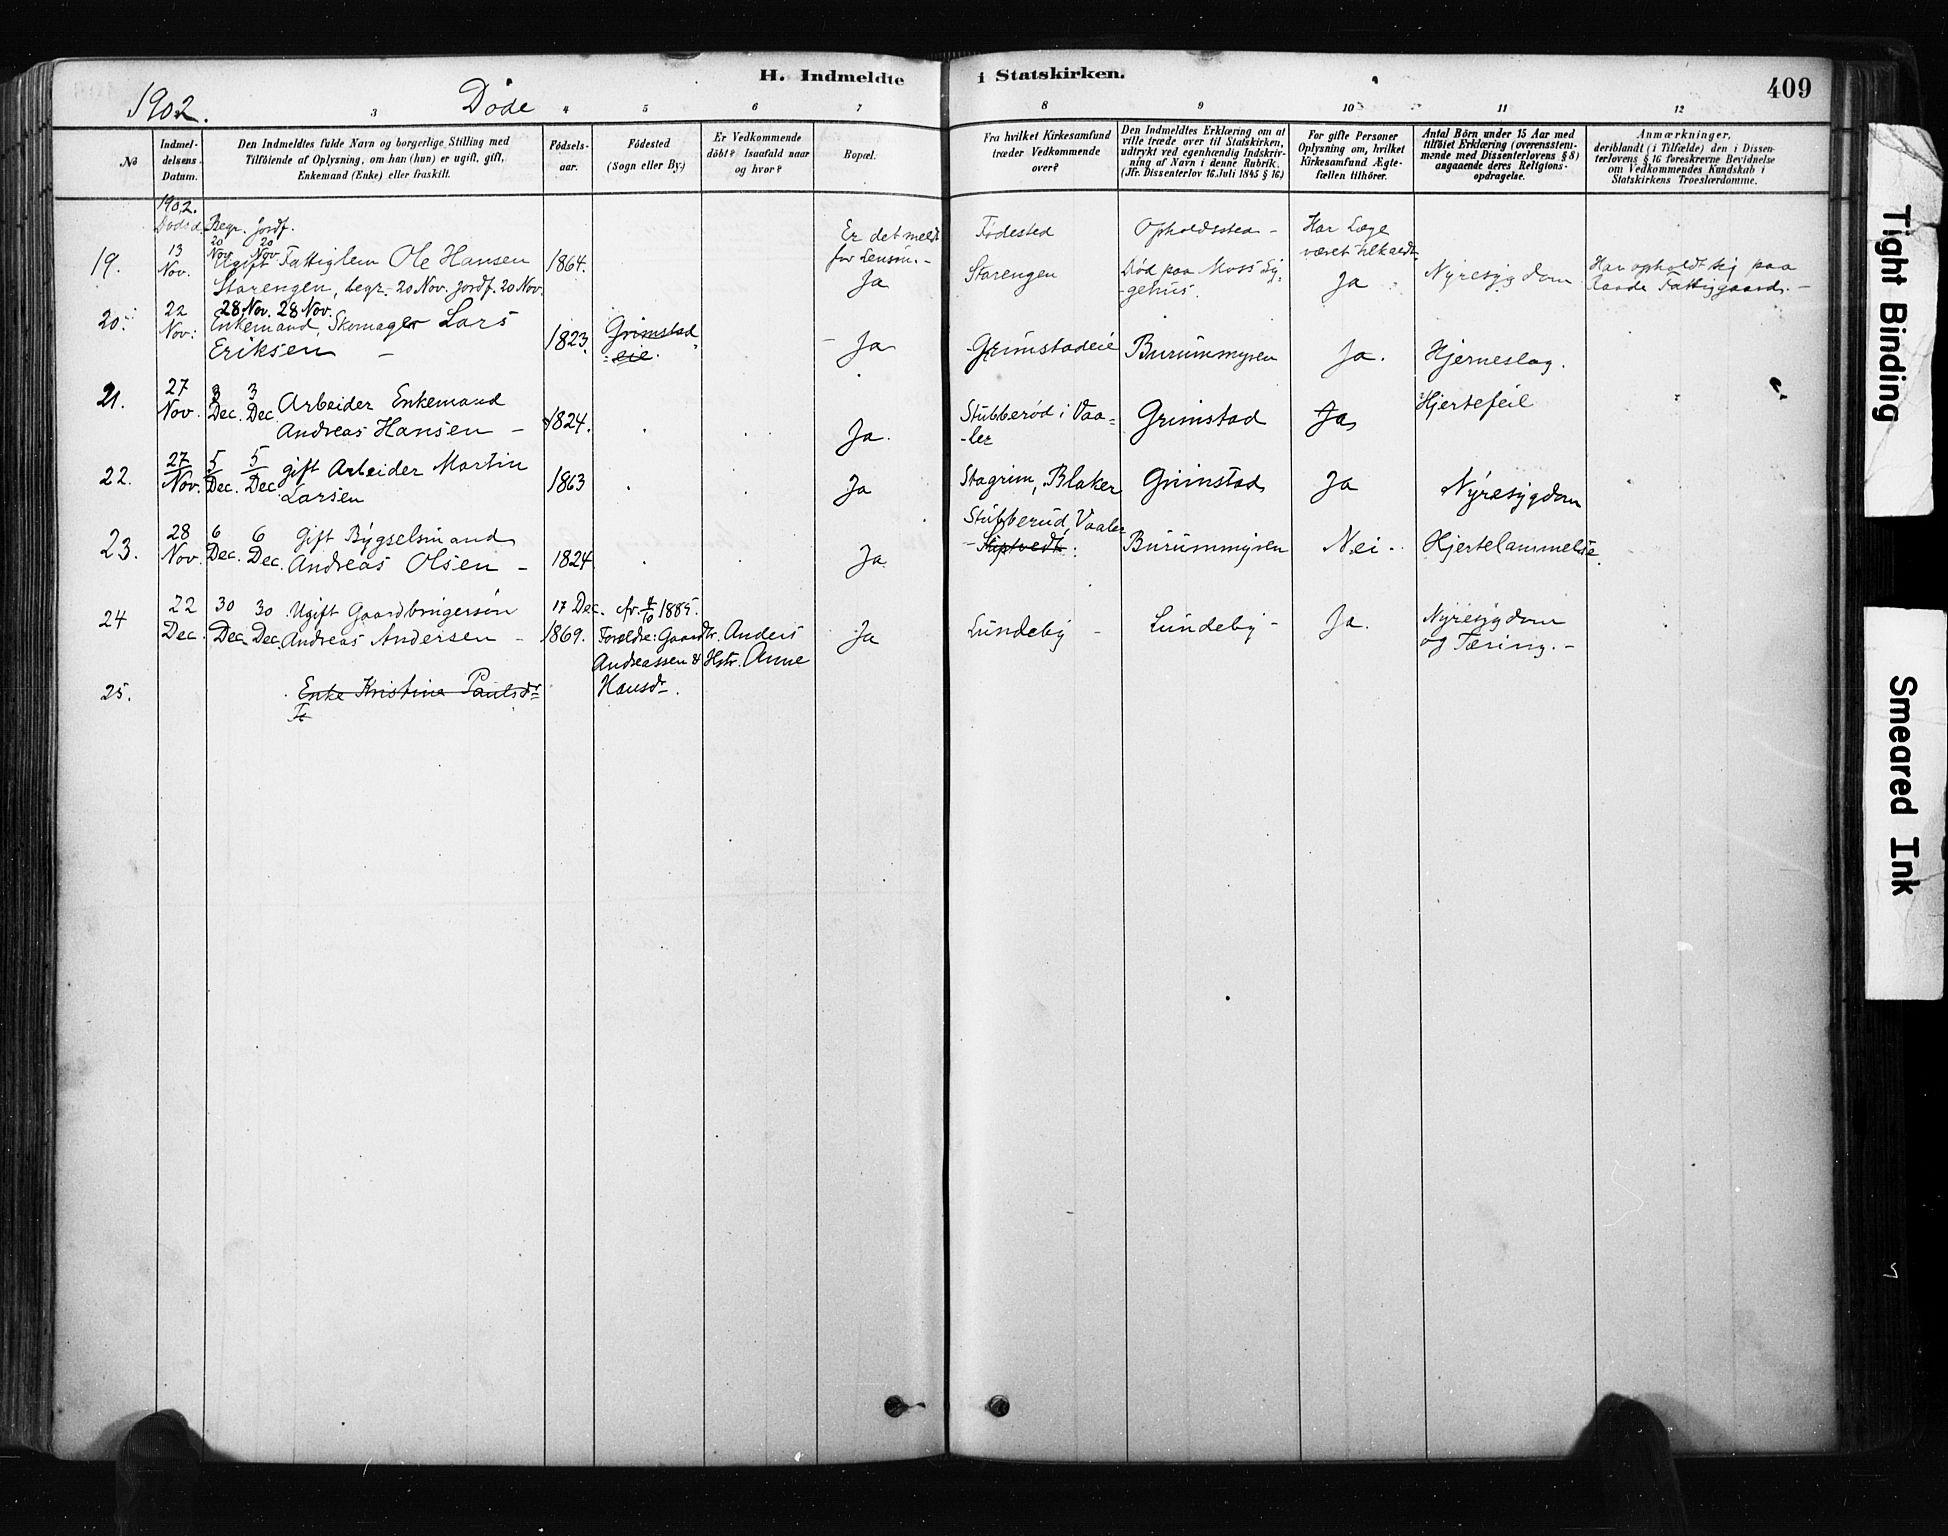 SAO, Råde prestekontor kirkebøker, F/Fa/L0007: Ministerialbok nr. 7, 1878-1902, s. 409